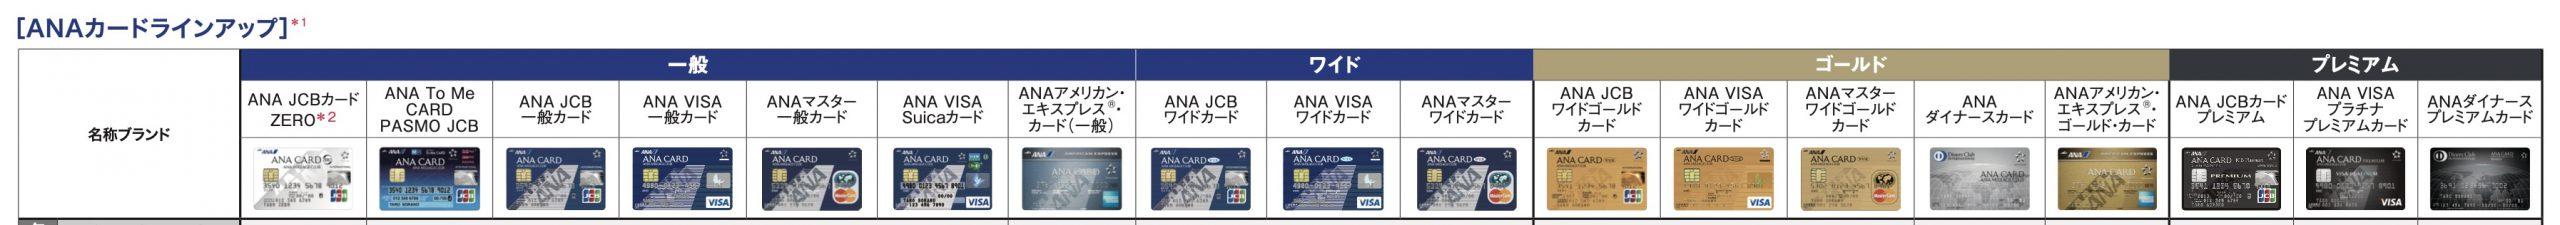 ANAカードの分類一覧